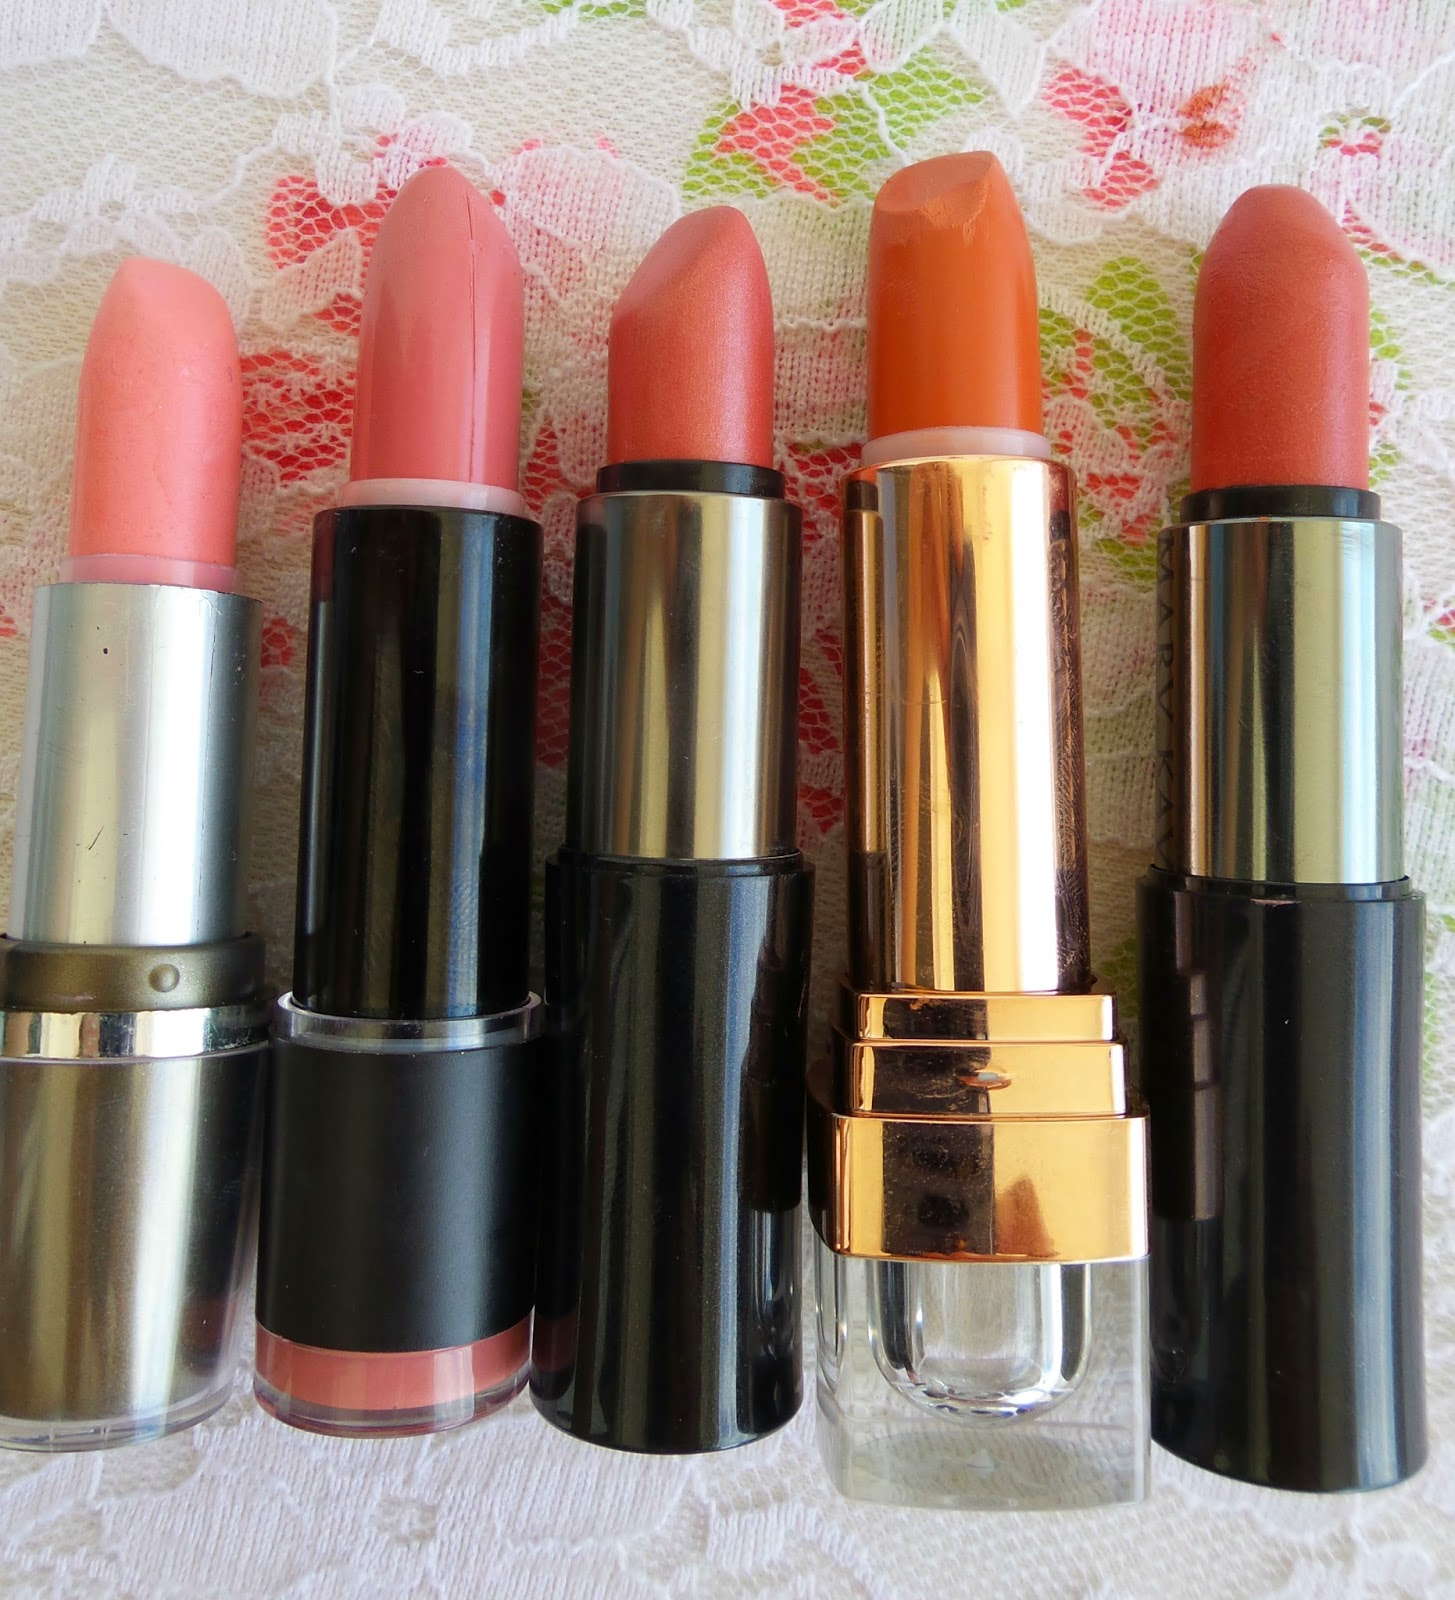 Batom Dailus: Pêssego,  Batom Impala: Pêssego Clássico, Mary Kay: Dusty Rose, Batom Teeez: Uniquely Pink, Ice peach